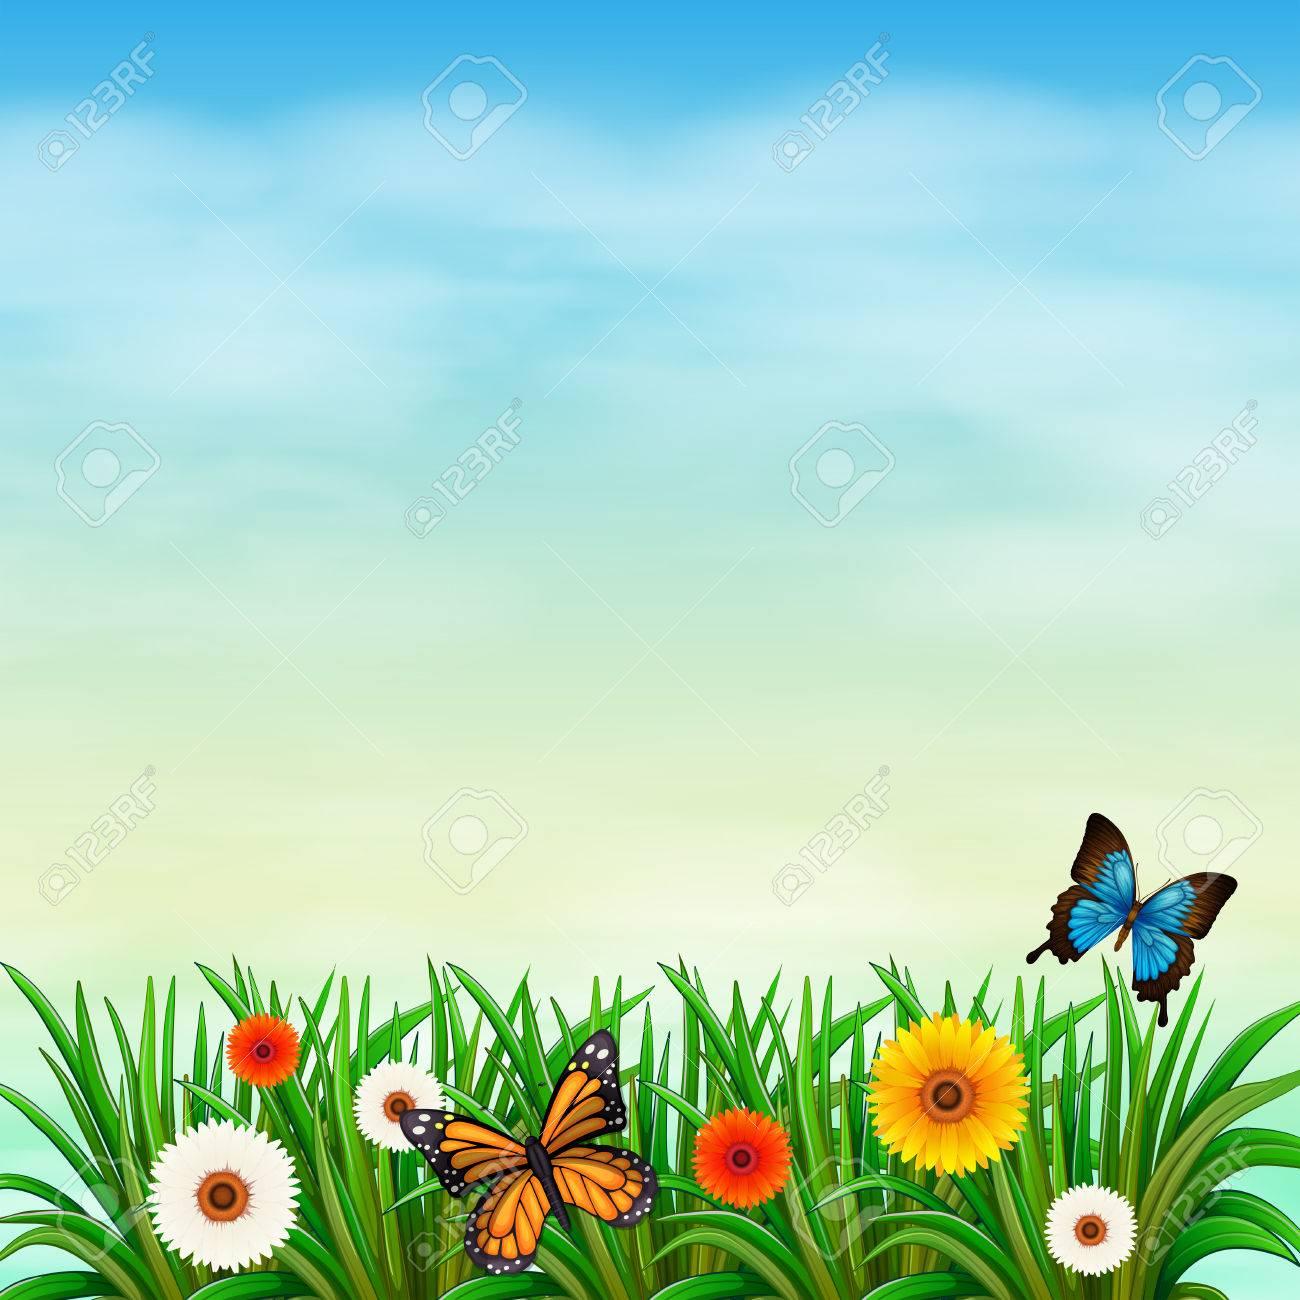 Flower Garden With Butterfly